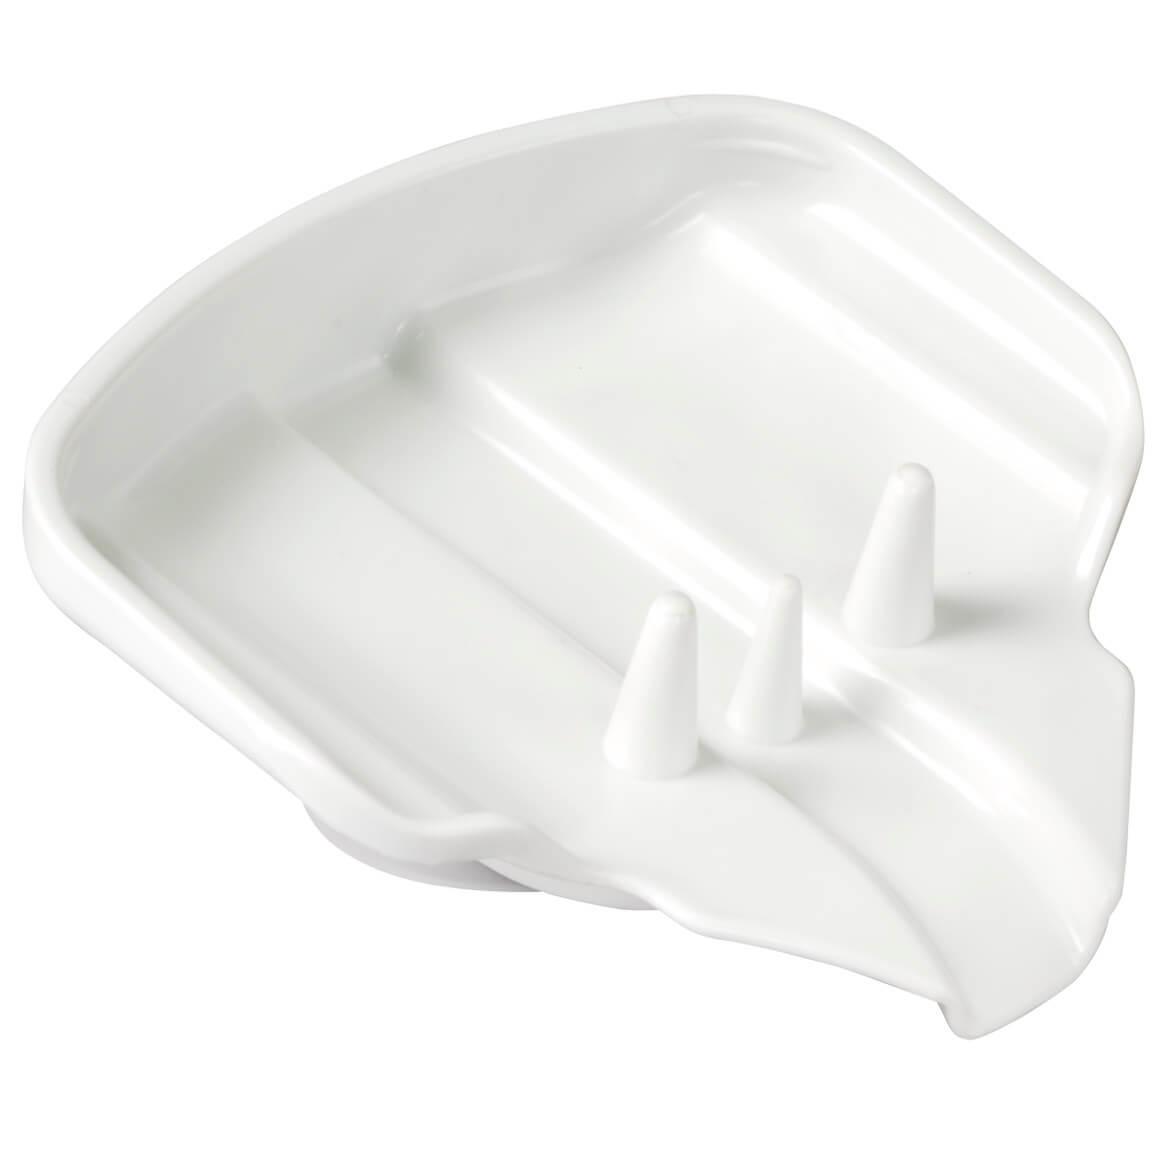 Soap Saver Soap Dish-312291